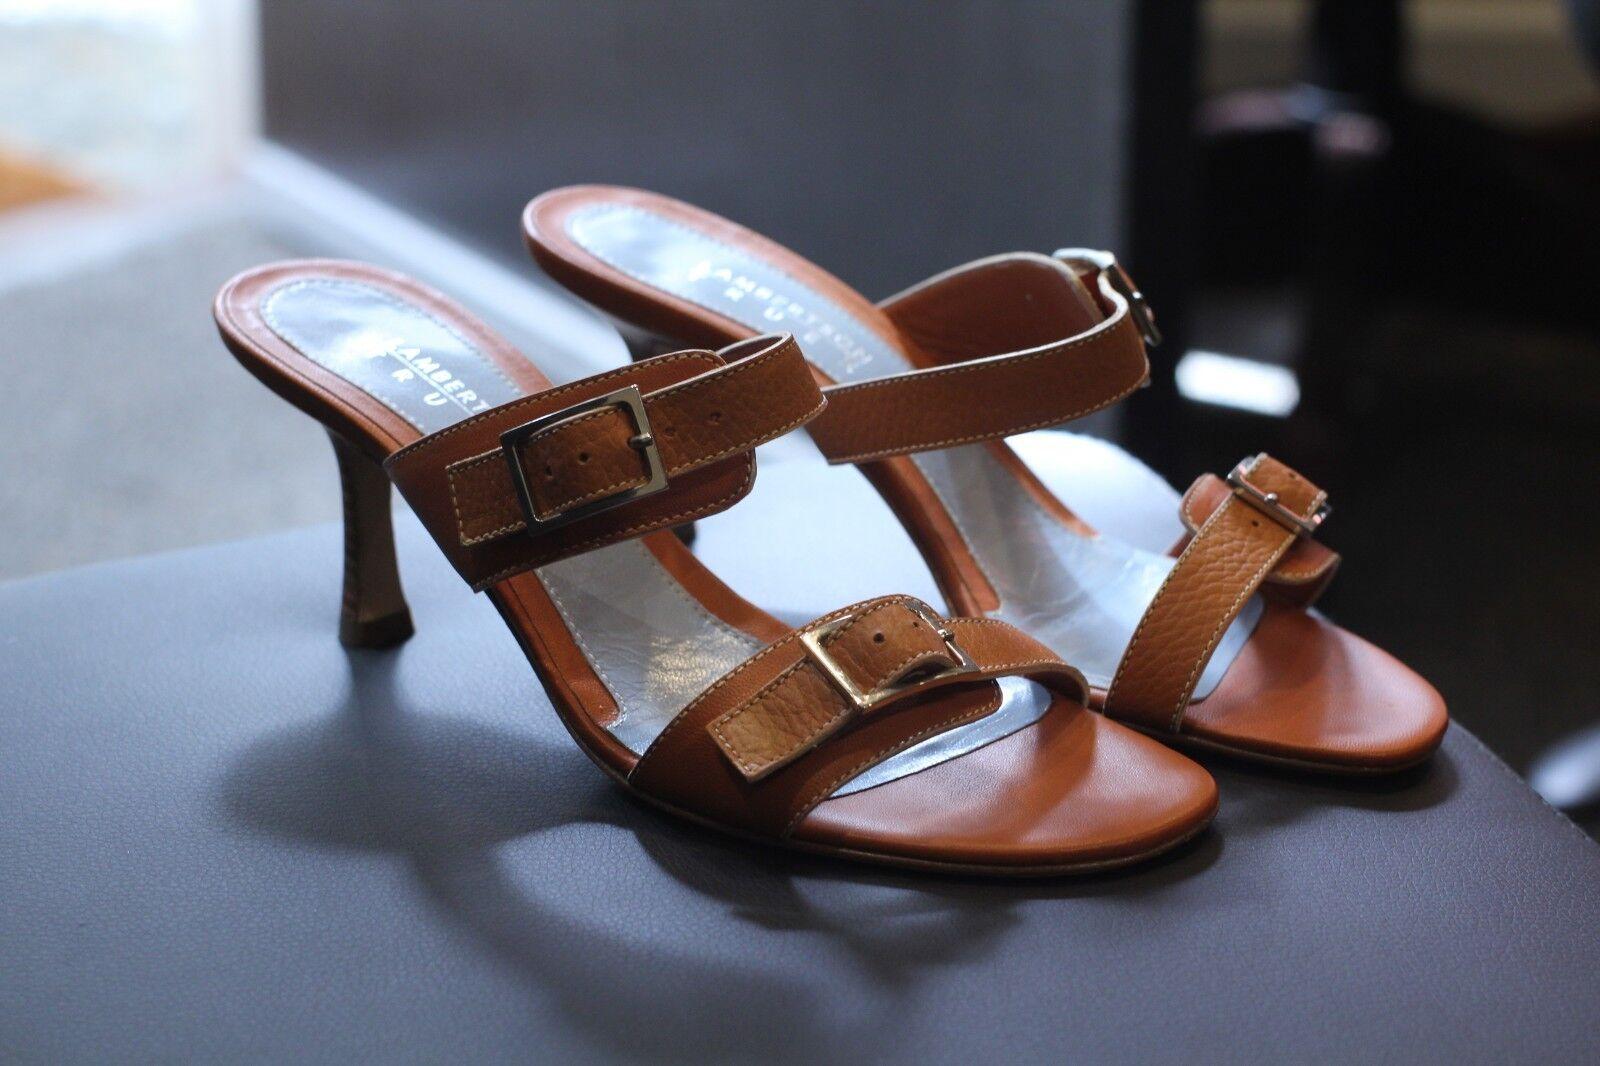 Lambertson Truex Light Brown Cognac Leather Sandals shoes Heels New Size 8.5